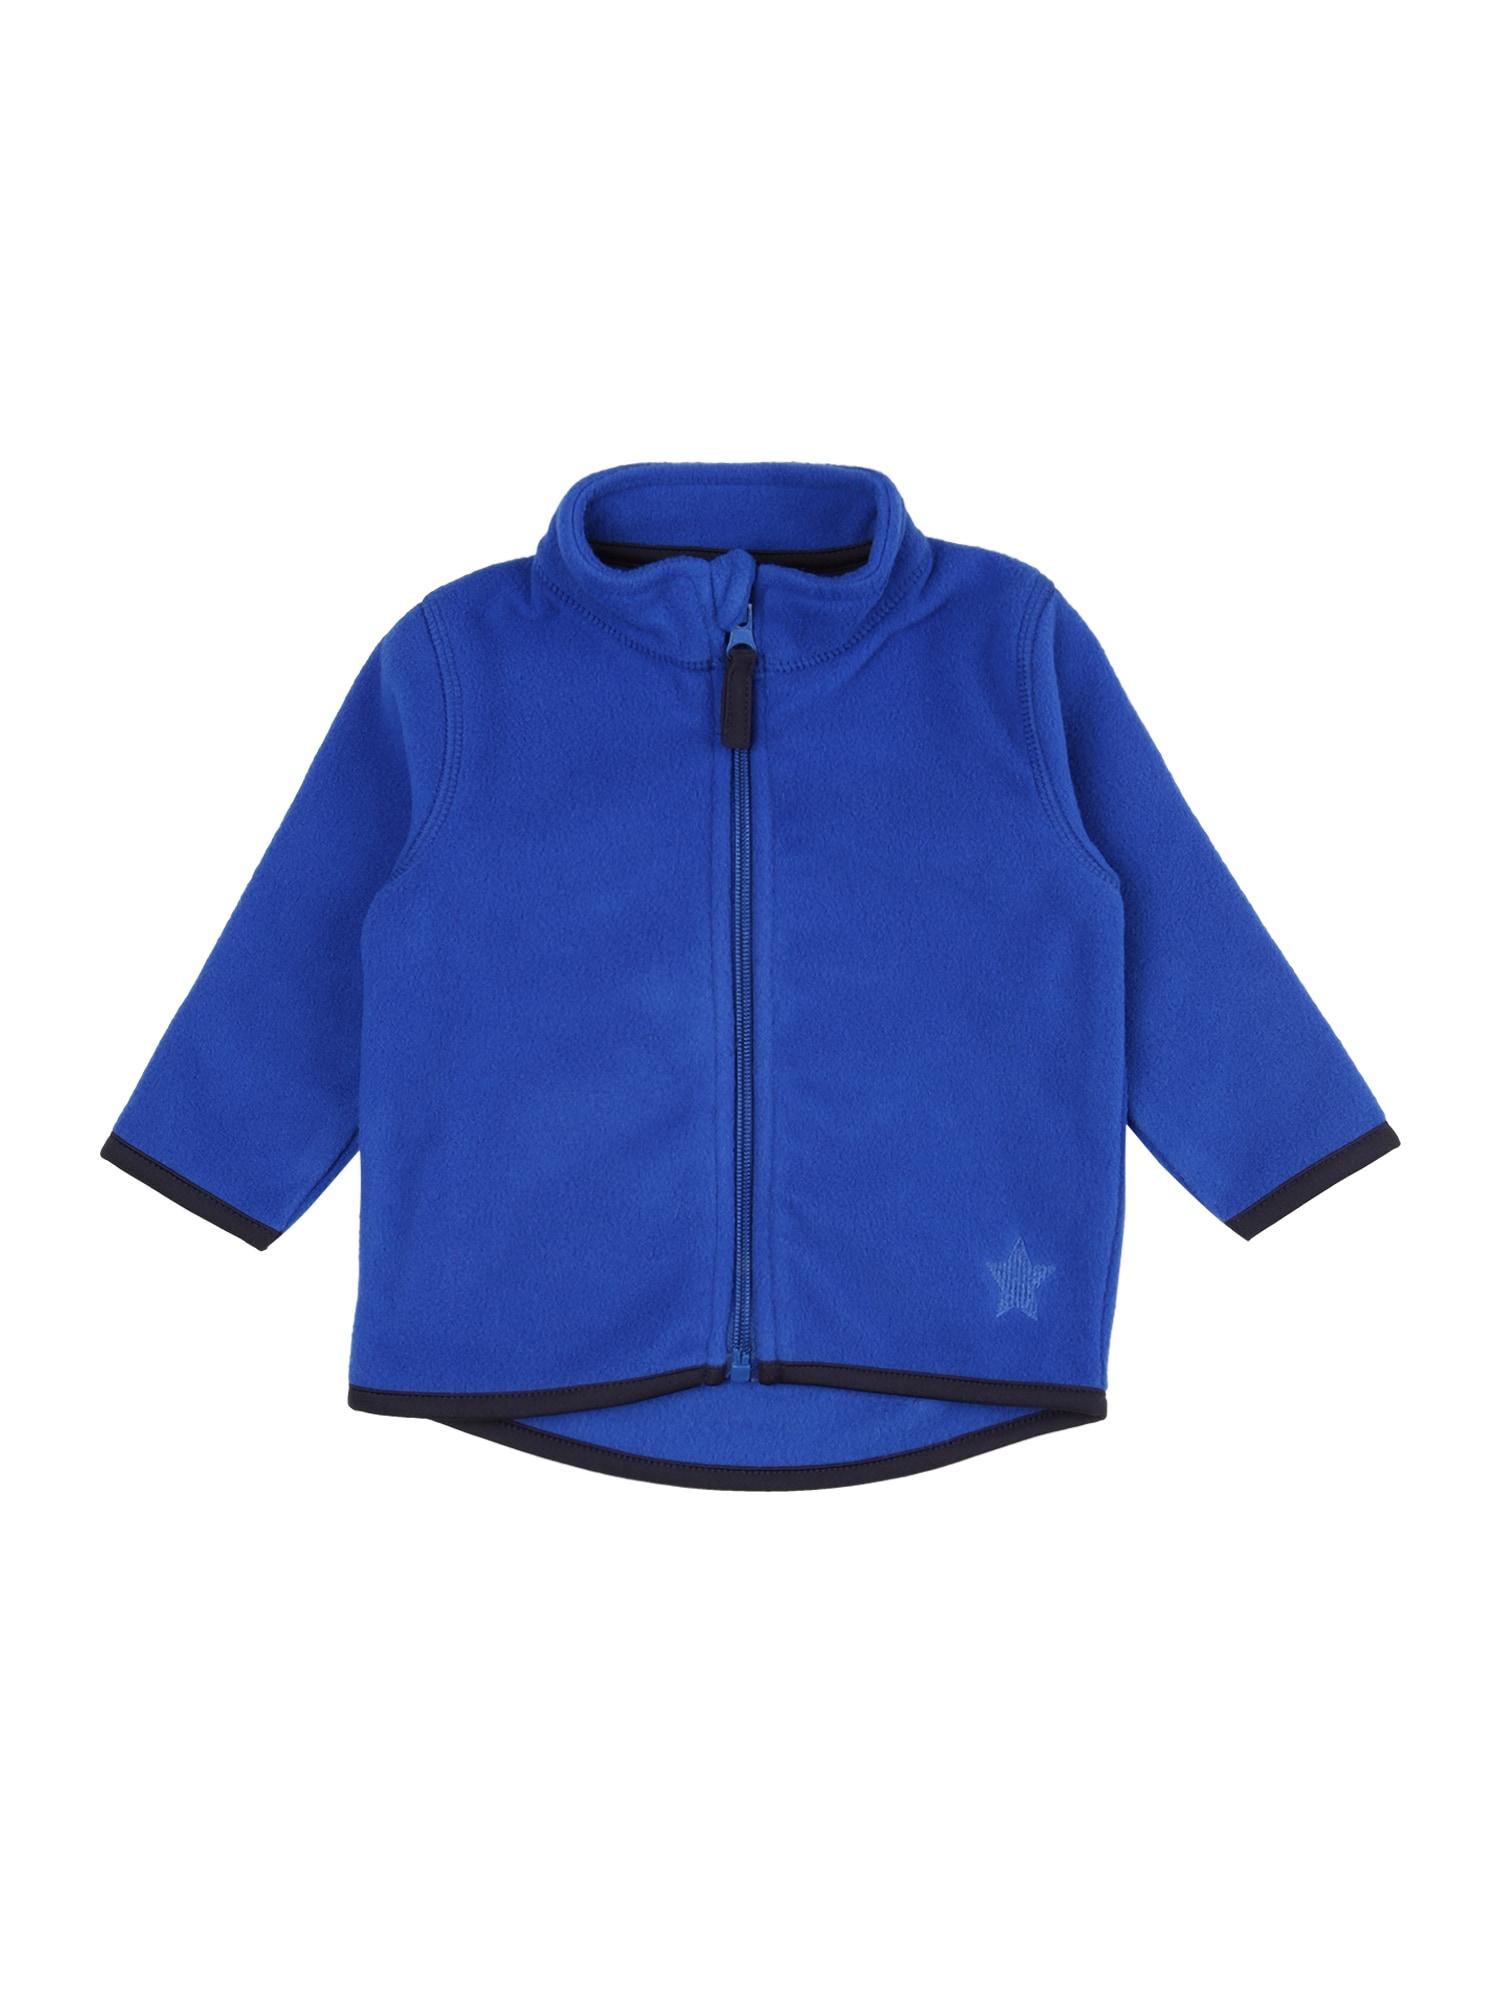 "BLUE SEVEN Flisinis džemperis sodri mėlyna (""karališka"") / nakties mėlyna"